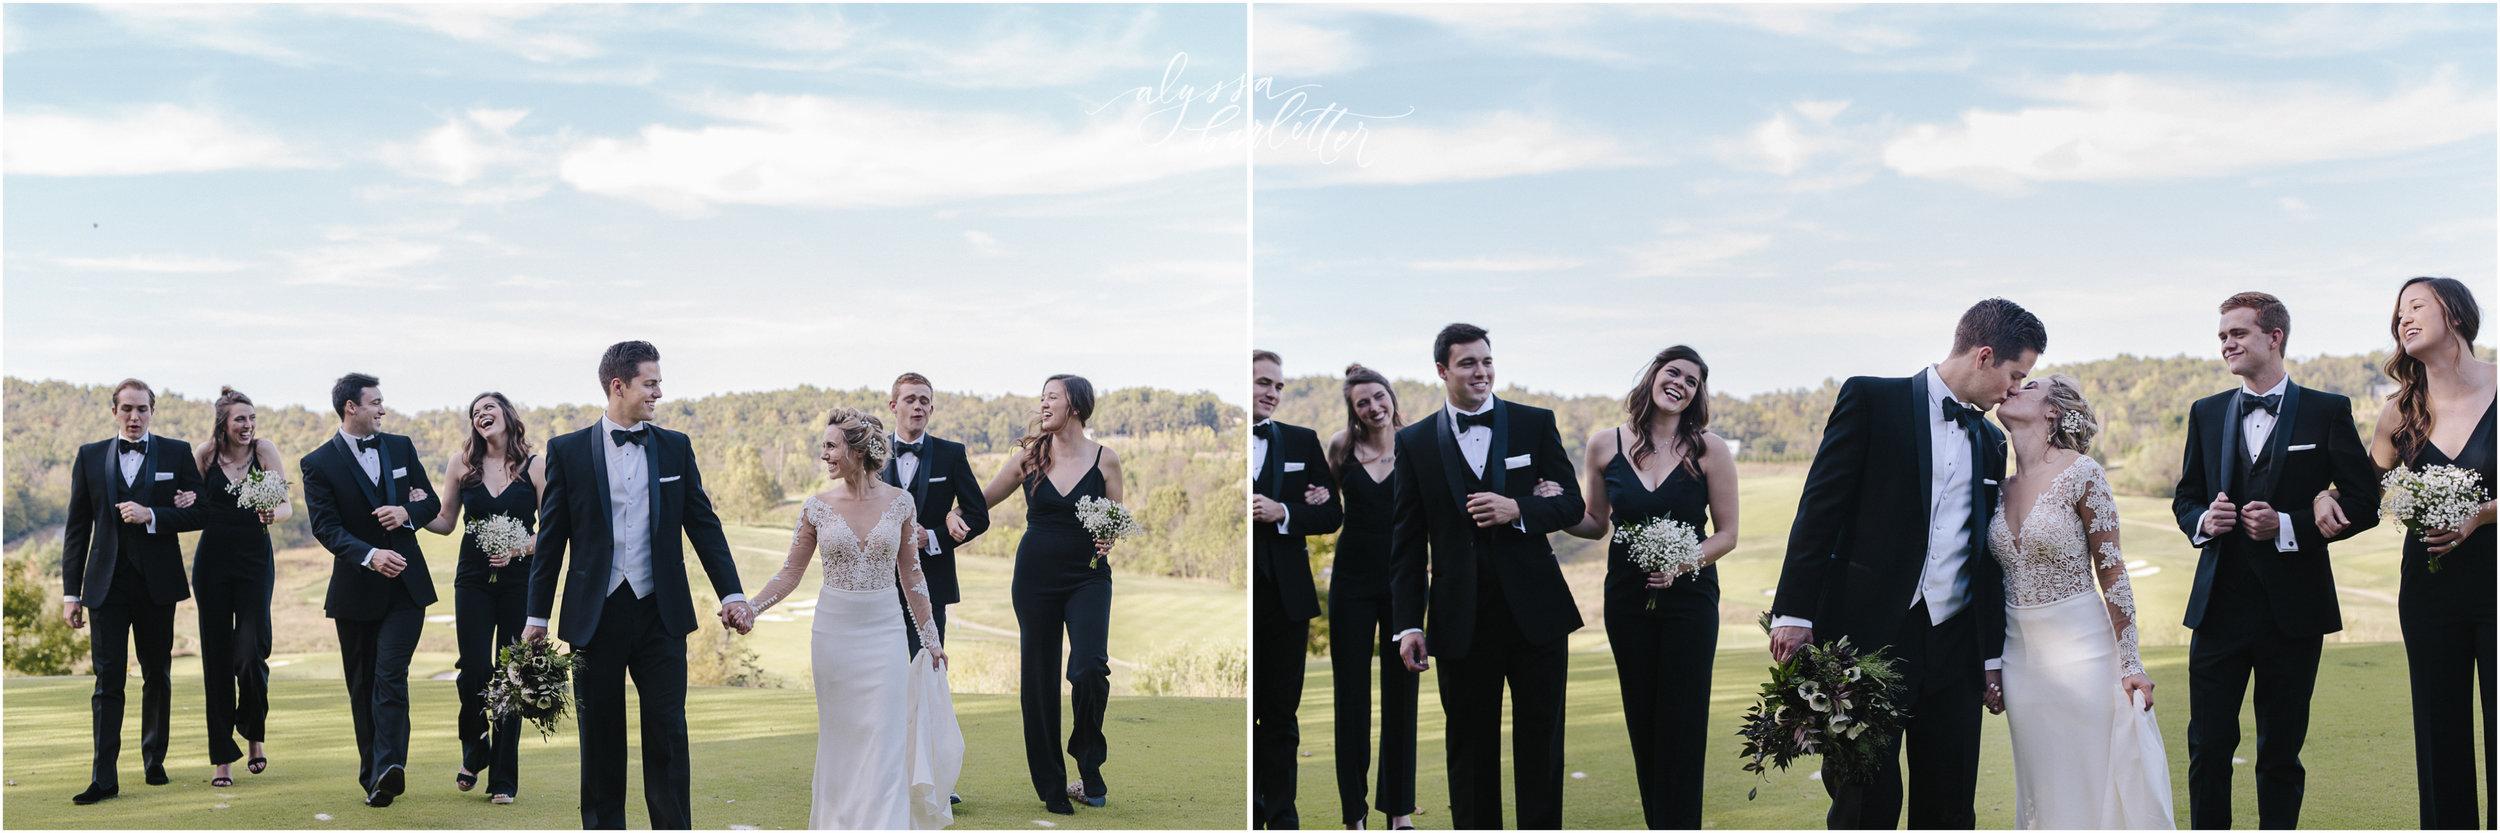 alyssa barletter photography fayetteville arkansas wedding photos micah and colin-1-36.jpg